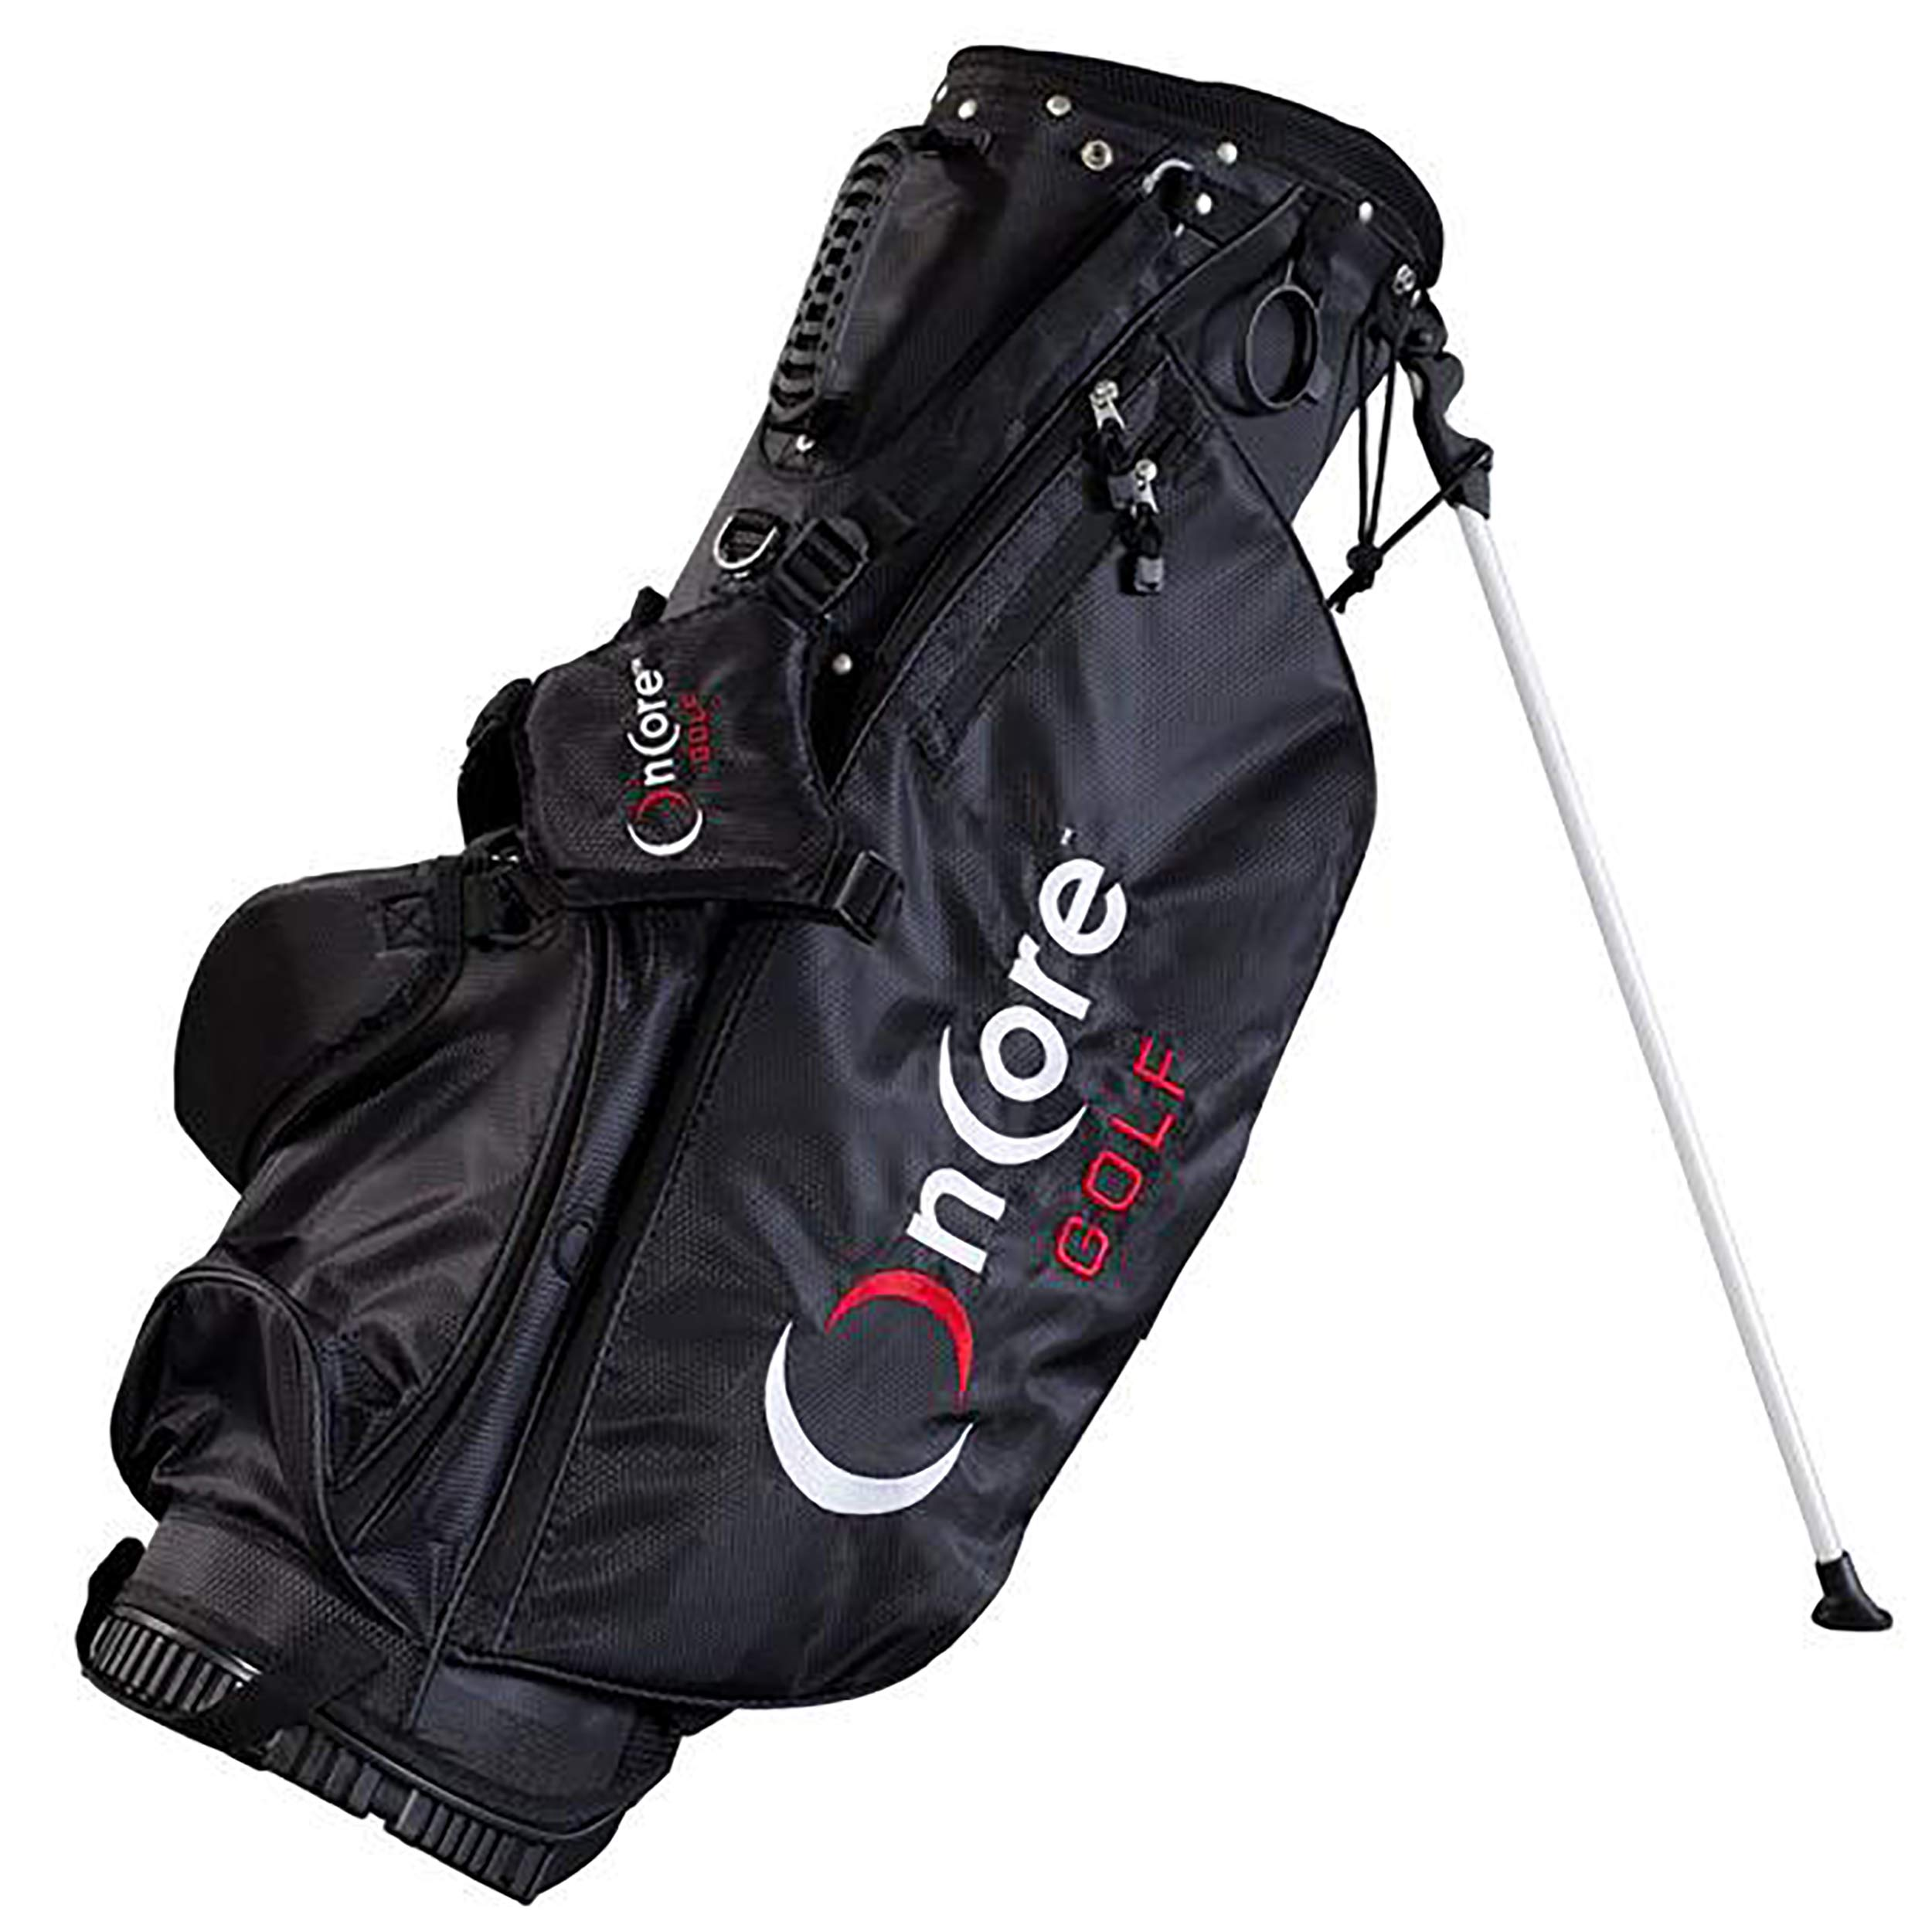 ONCORE GOLF Bags | Stand Golf Bag | Padded Carrying Strap | Full-Length Club Dividers | Lightweight & Durable Design | Umbrella Holder & Removable Rain Hood | Black Golf Bag